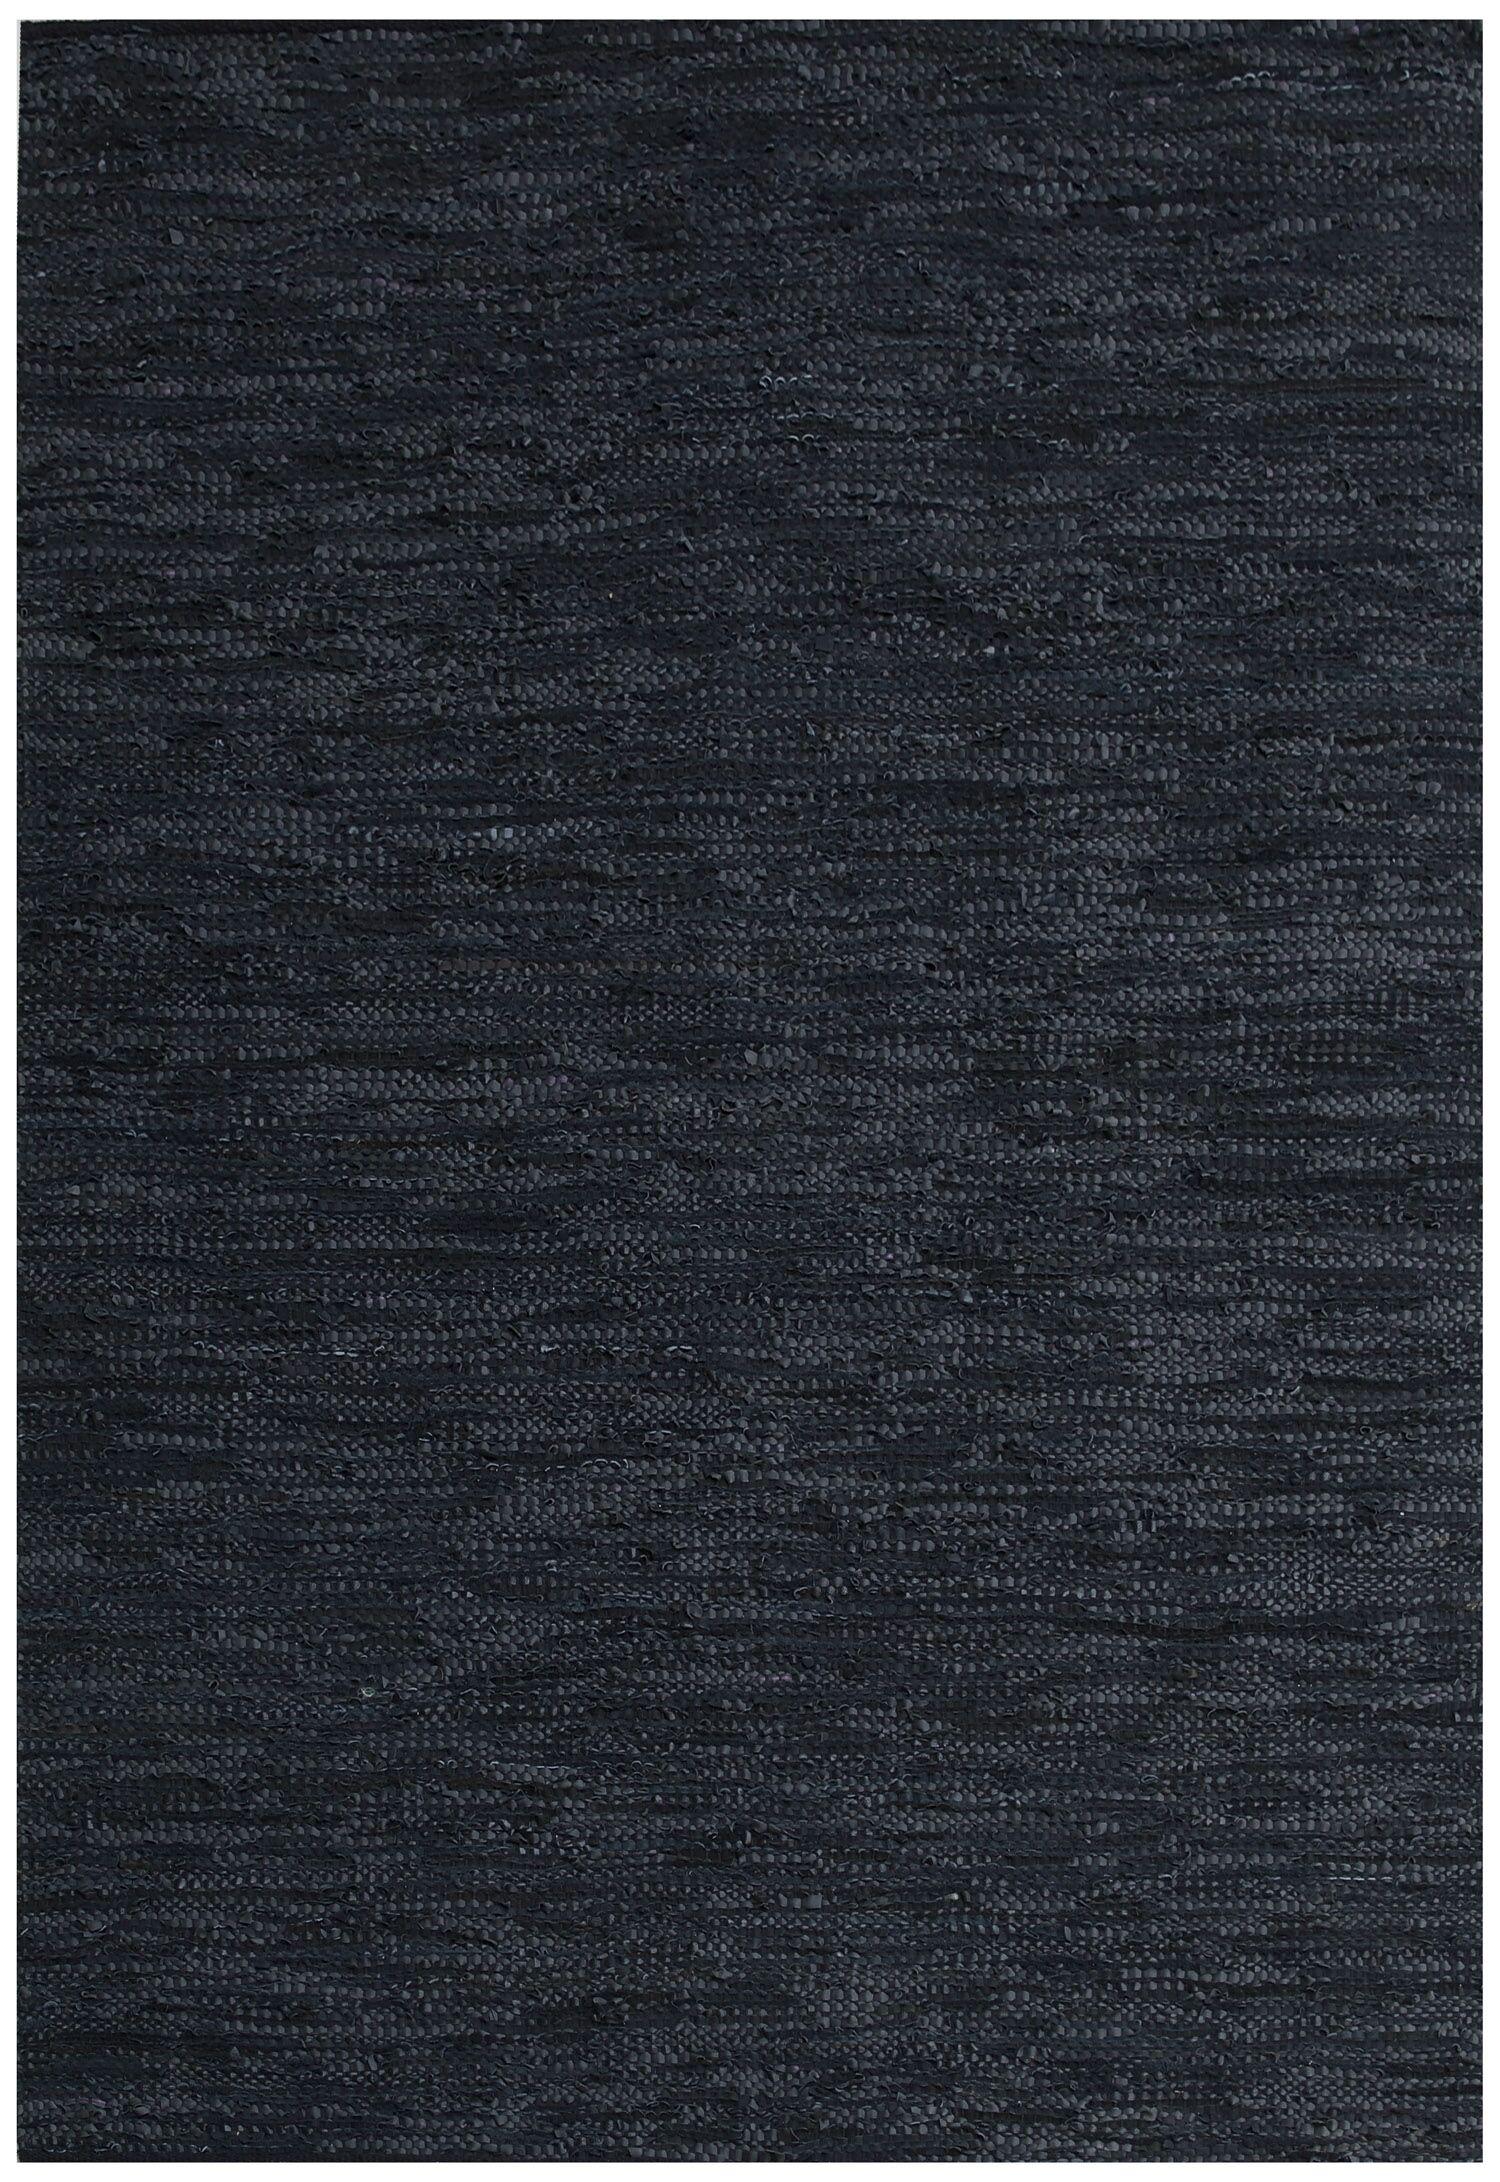 Black Area Rug Rug Size: 6' x 9'